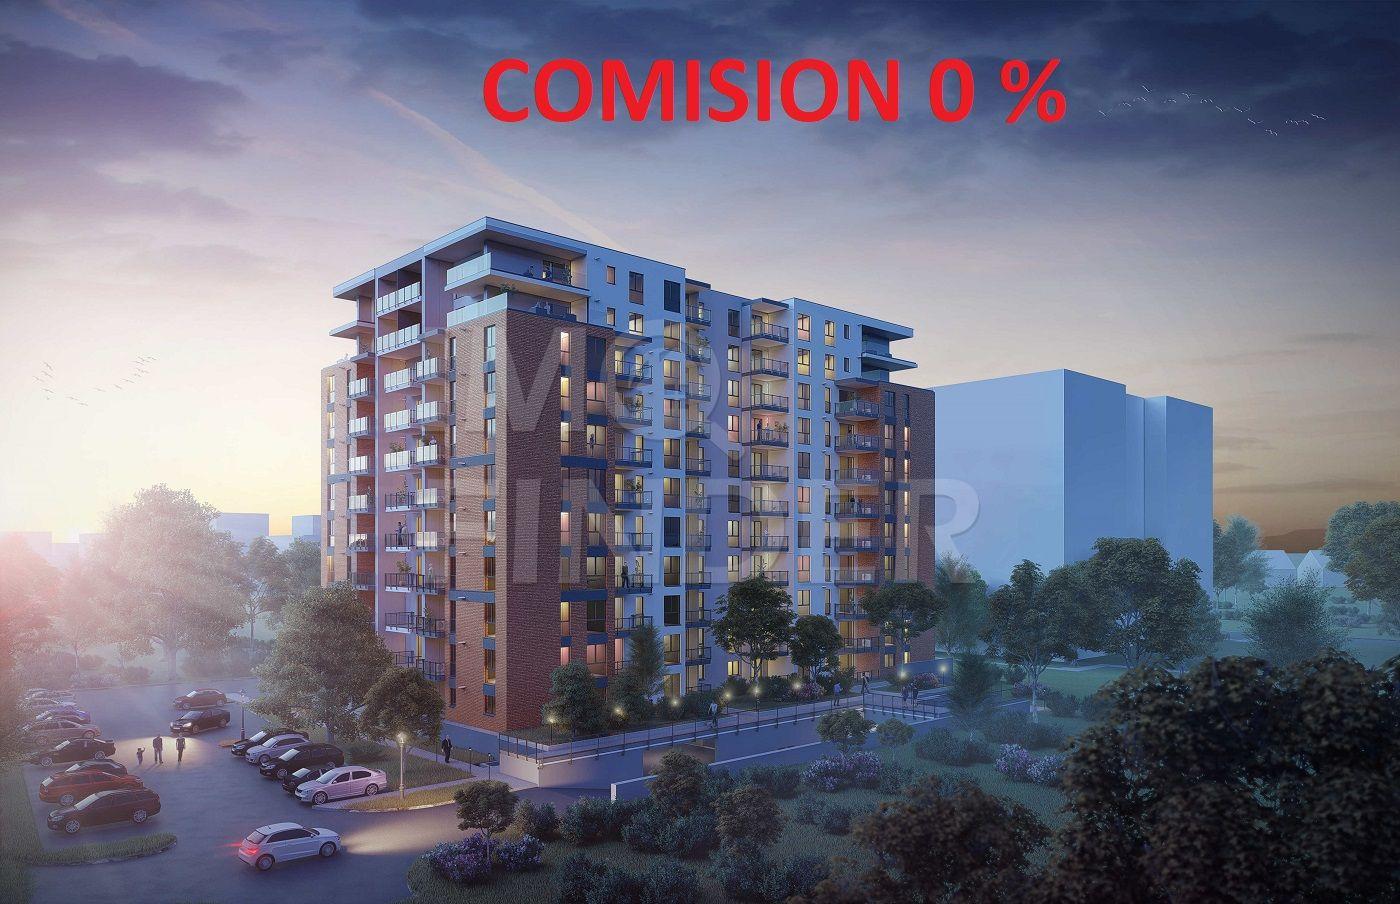 Vanzare apartamente 2, 3 camere, proiect nou, cartier Buna Ziua